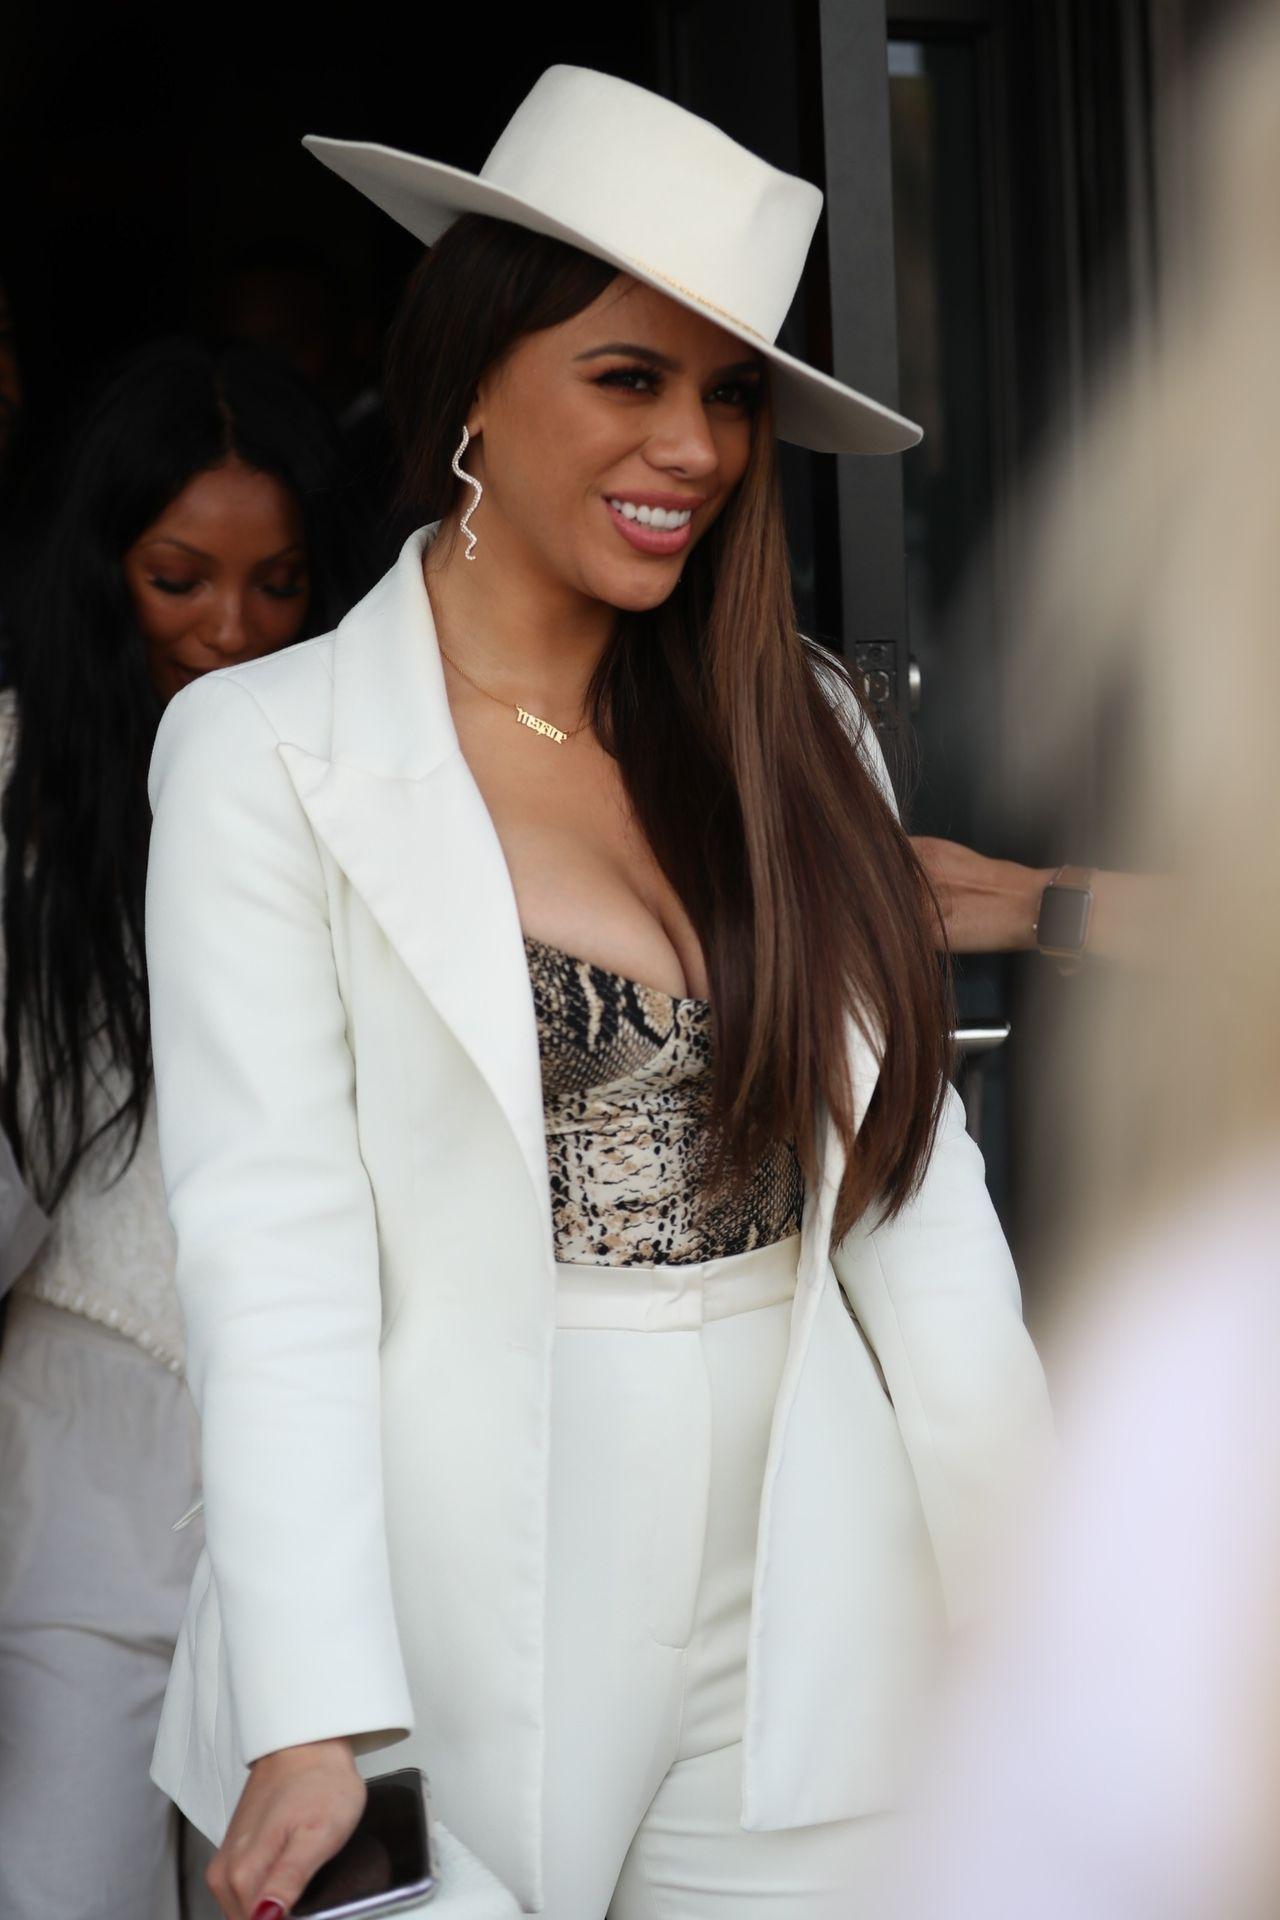 Dinah Jane Departs The Women In Harmony Pre Grammy Luncheon 0031